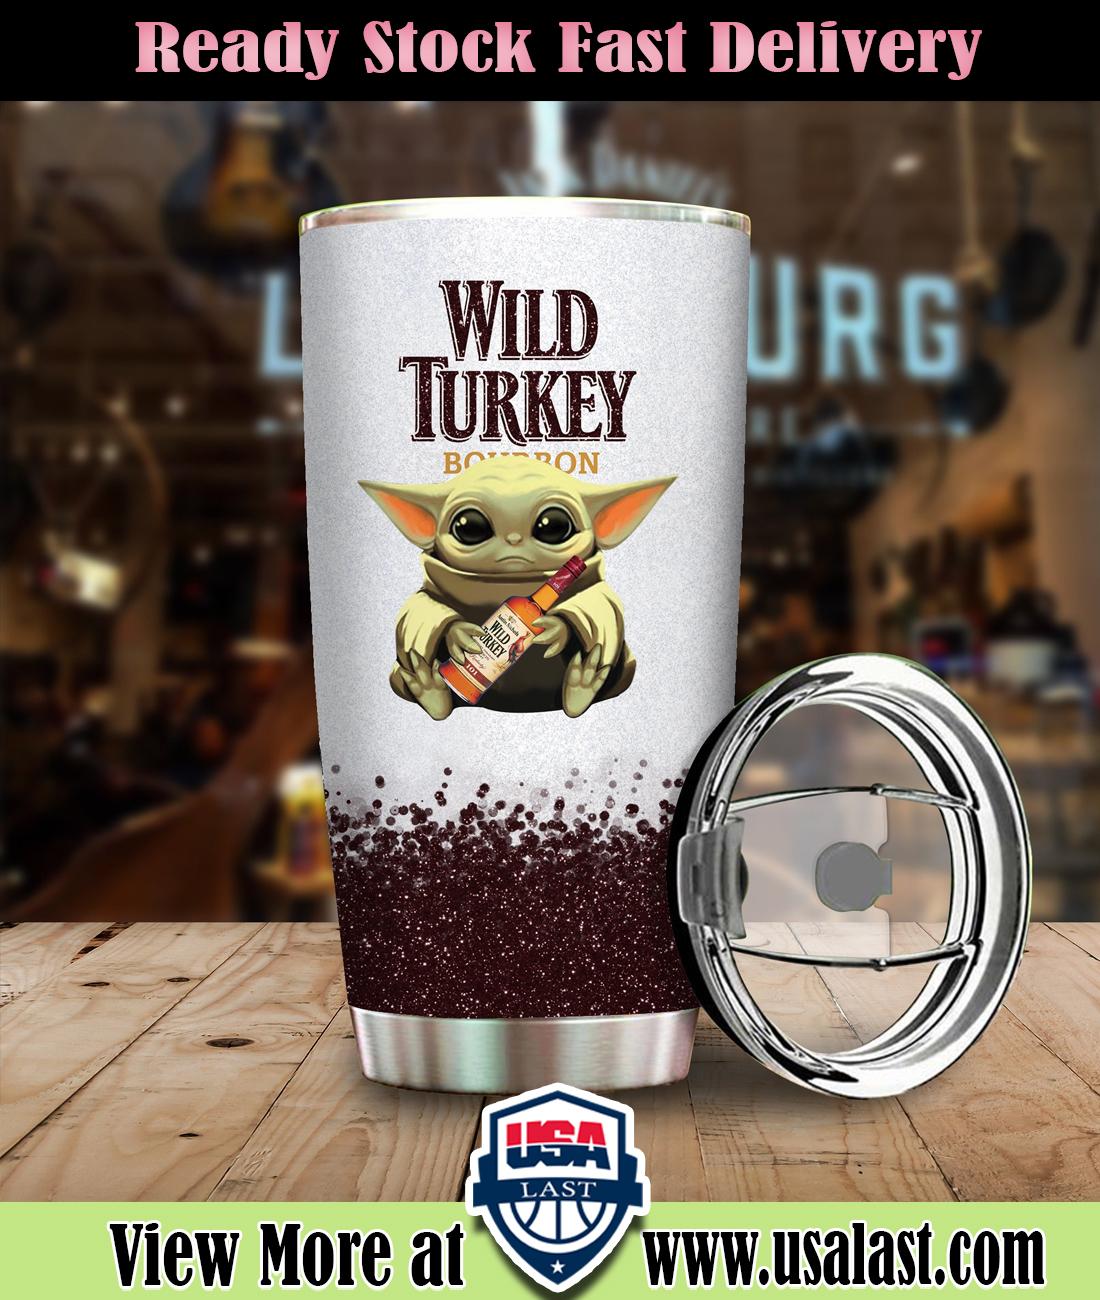 Baby Yoda Hold Wild Turkey Wine Bottle Steel Tumbler